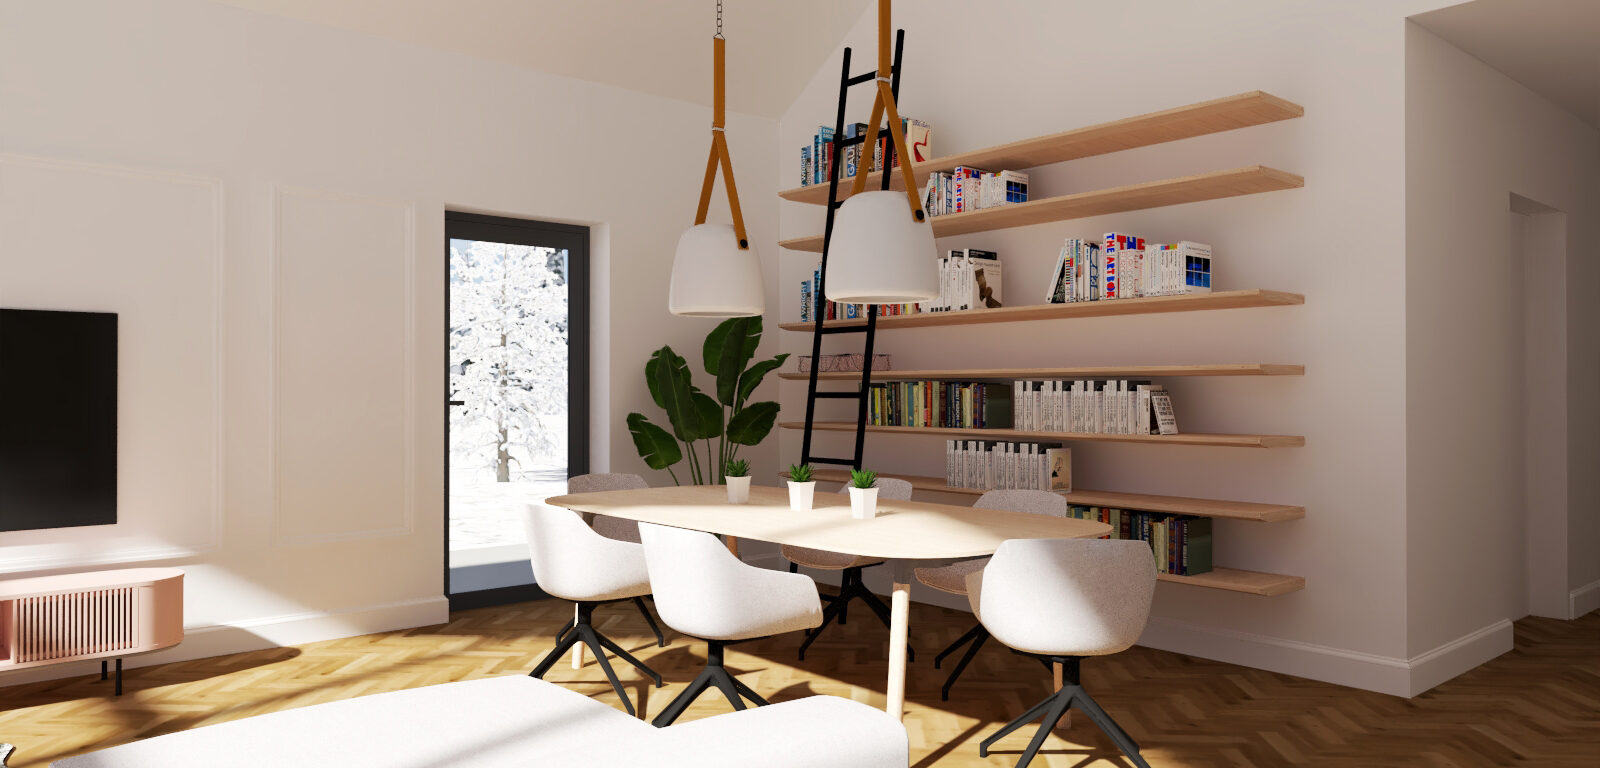 dacon-design-domanska-architekt-stodola-wnetrza-salon-jadalnia